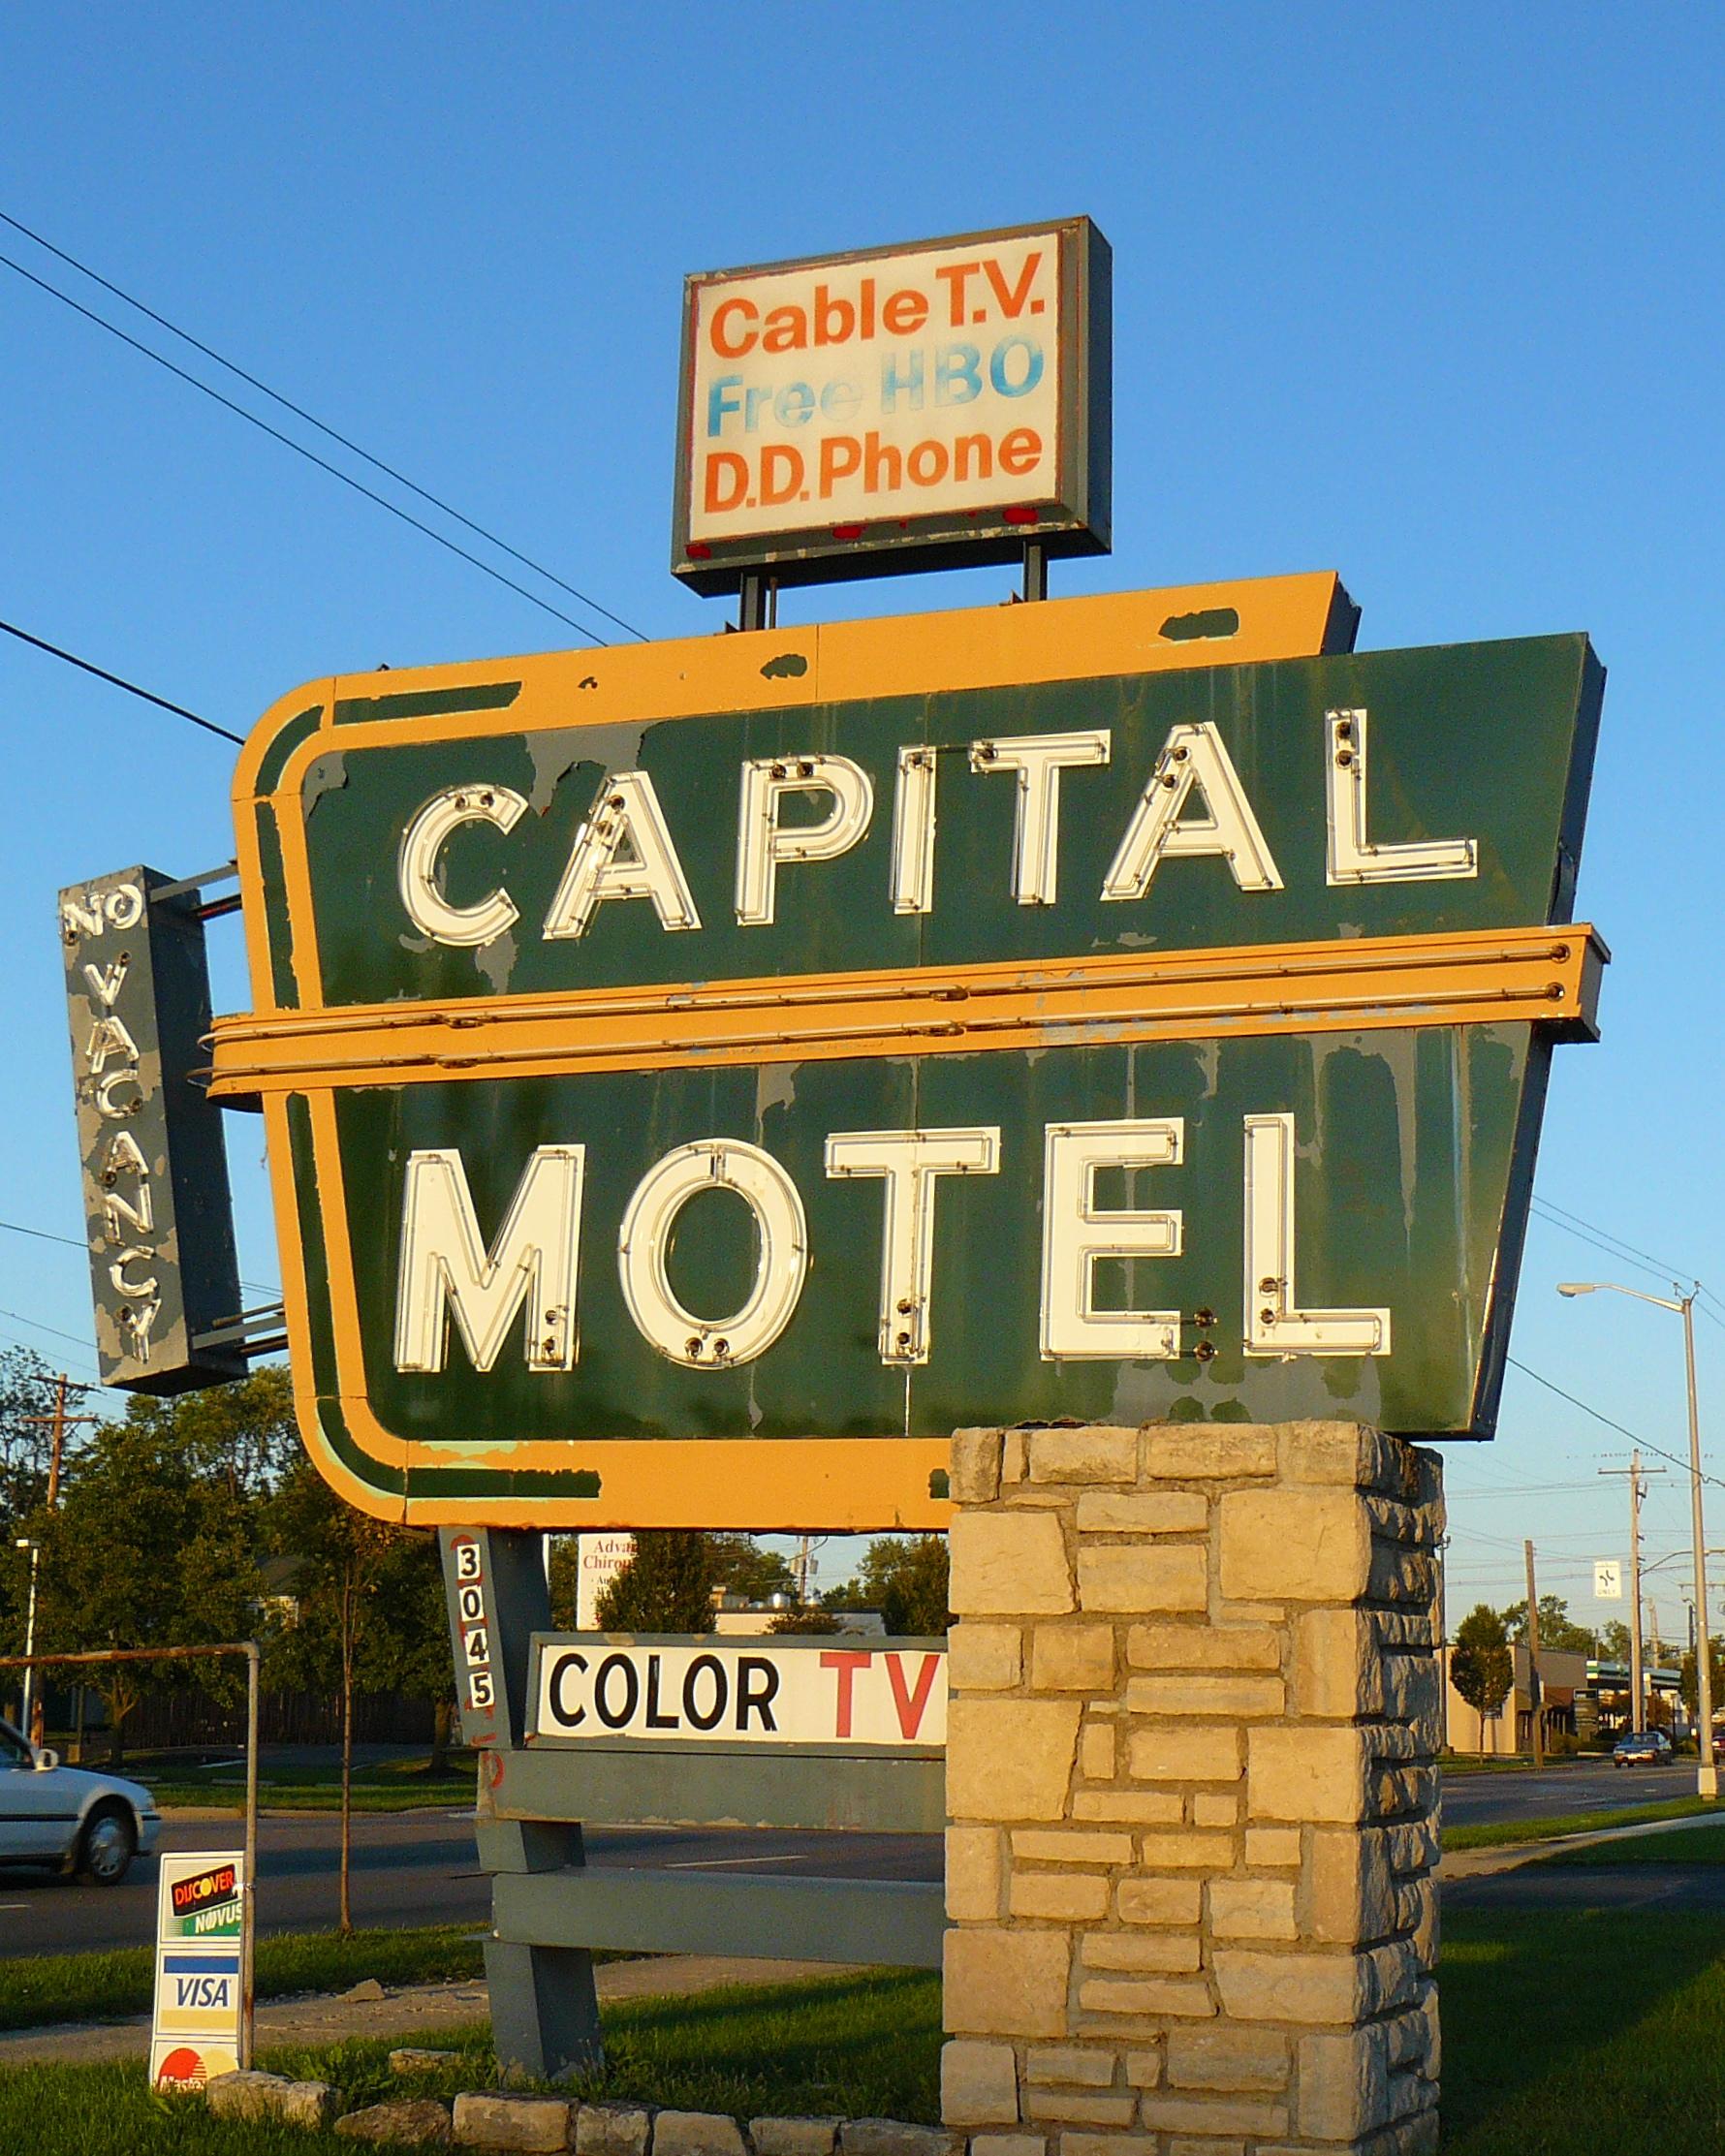 Capital Motel - 3045 East Main Street, Columbus, Ohio U.S.A. - September 18, 2008